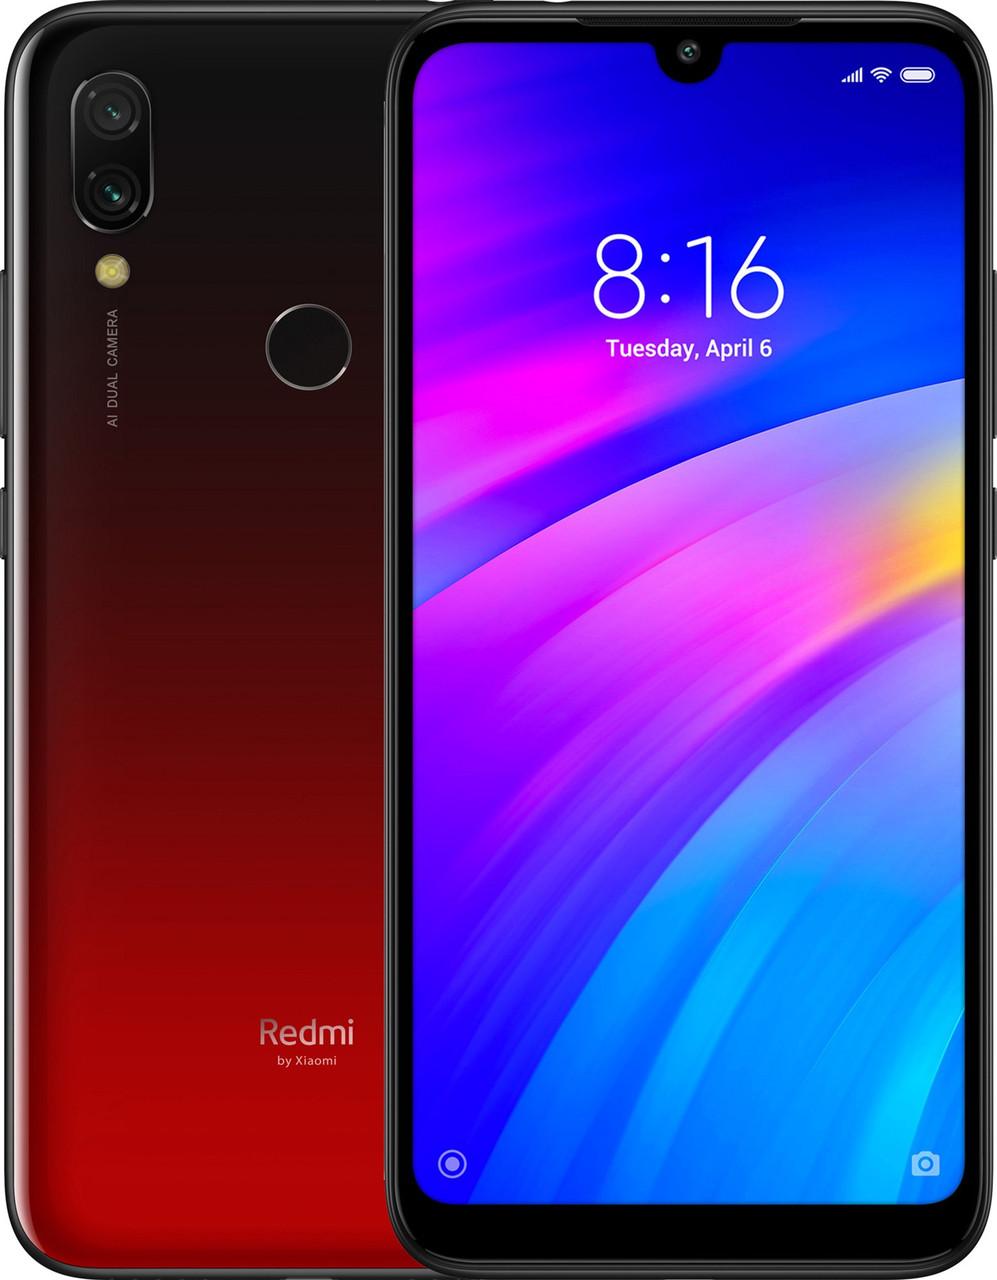 Xiaomi Redmi 7 3/32 | Красный | 4G/LTE | Международная версия | Гарантия